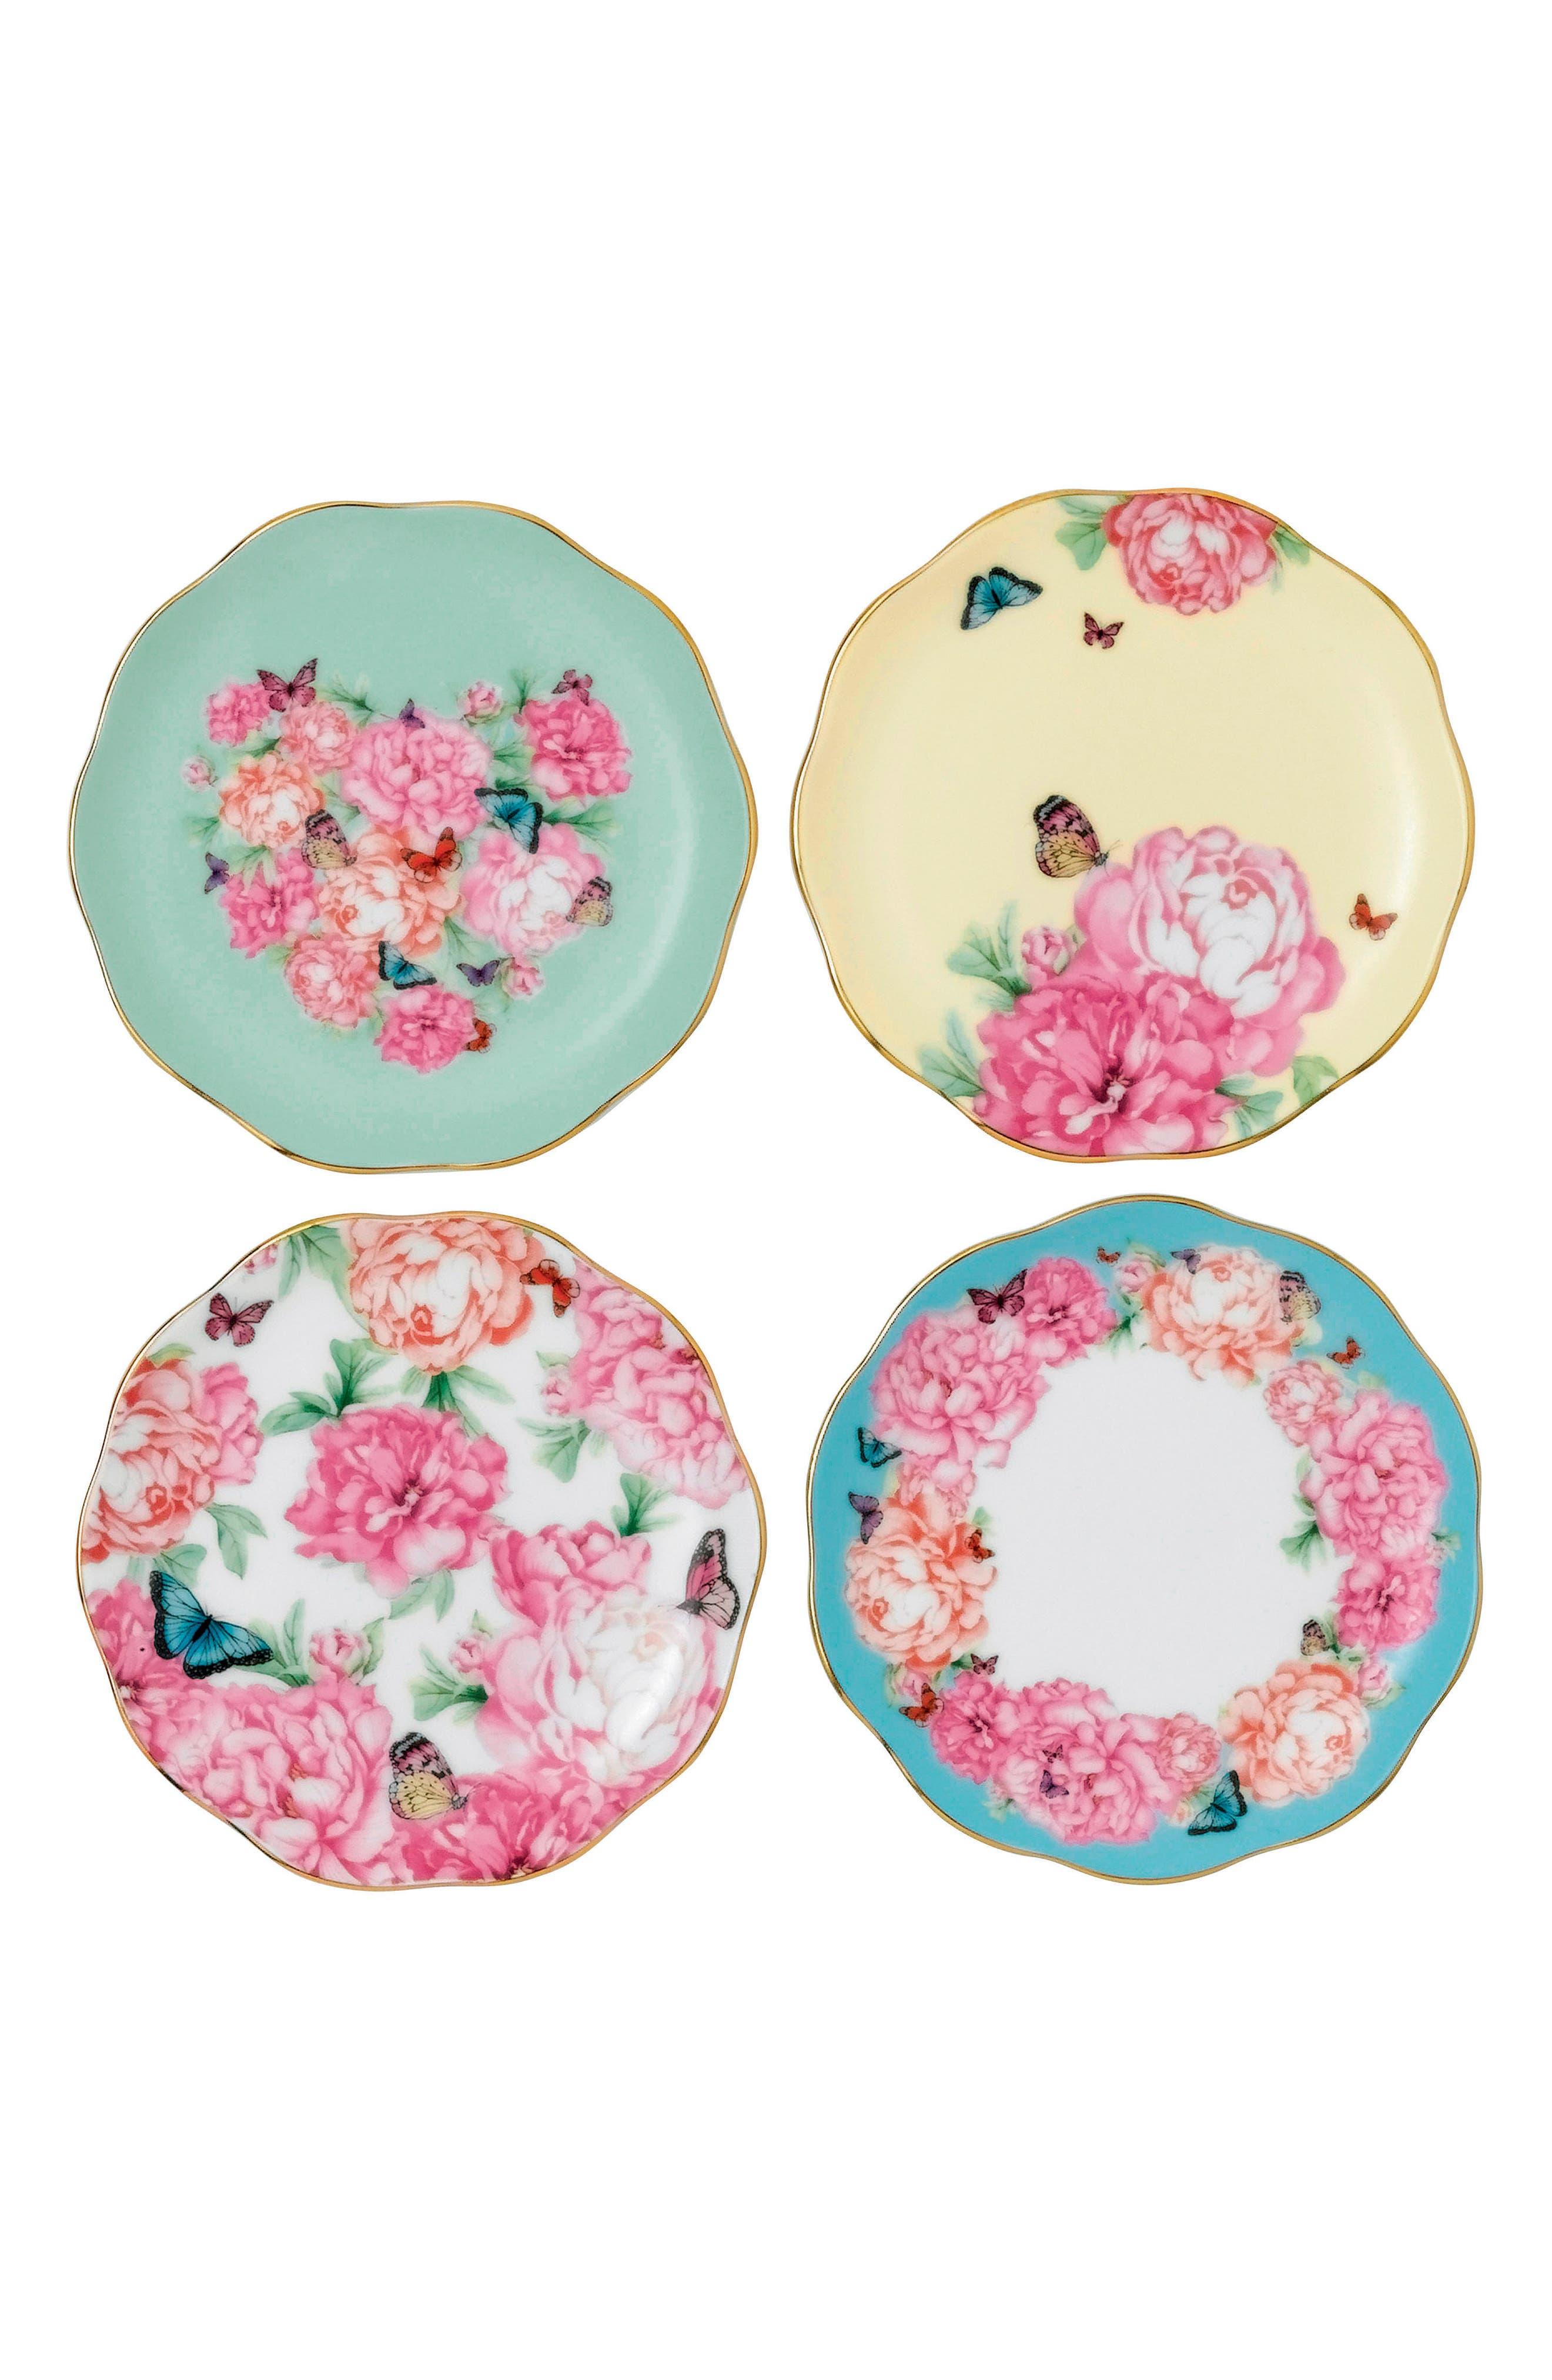 Main Image - Miranda Kerr for Royal Albert Set of 4 Assorted Tidbit Plates